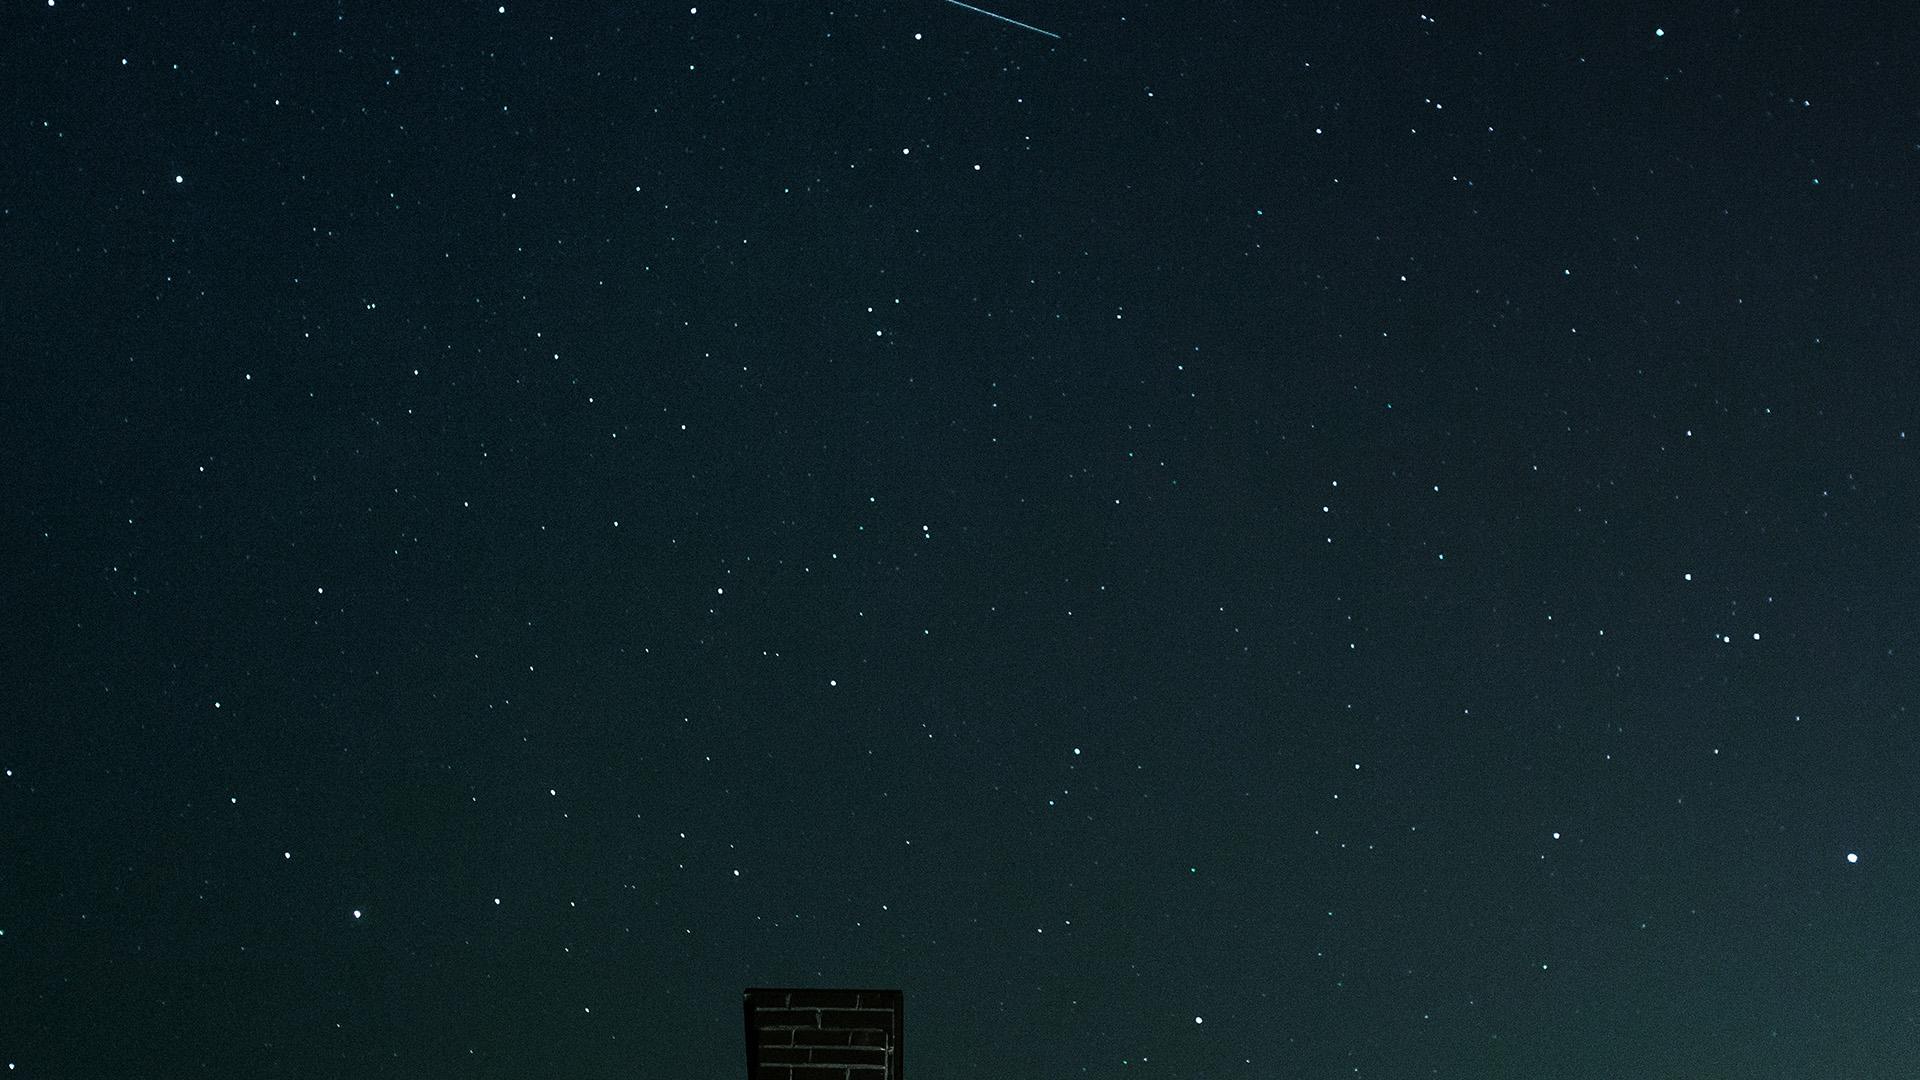 Fall Iphone 7 Plus Wallpaper Nd43 Star Night Sky Summer Dark Wallpaper